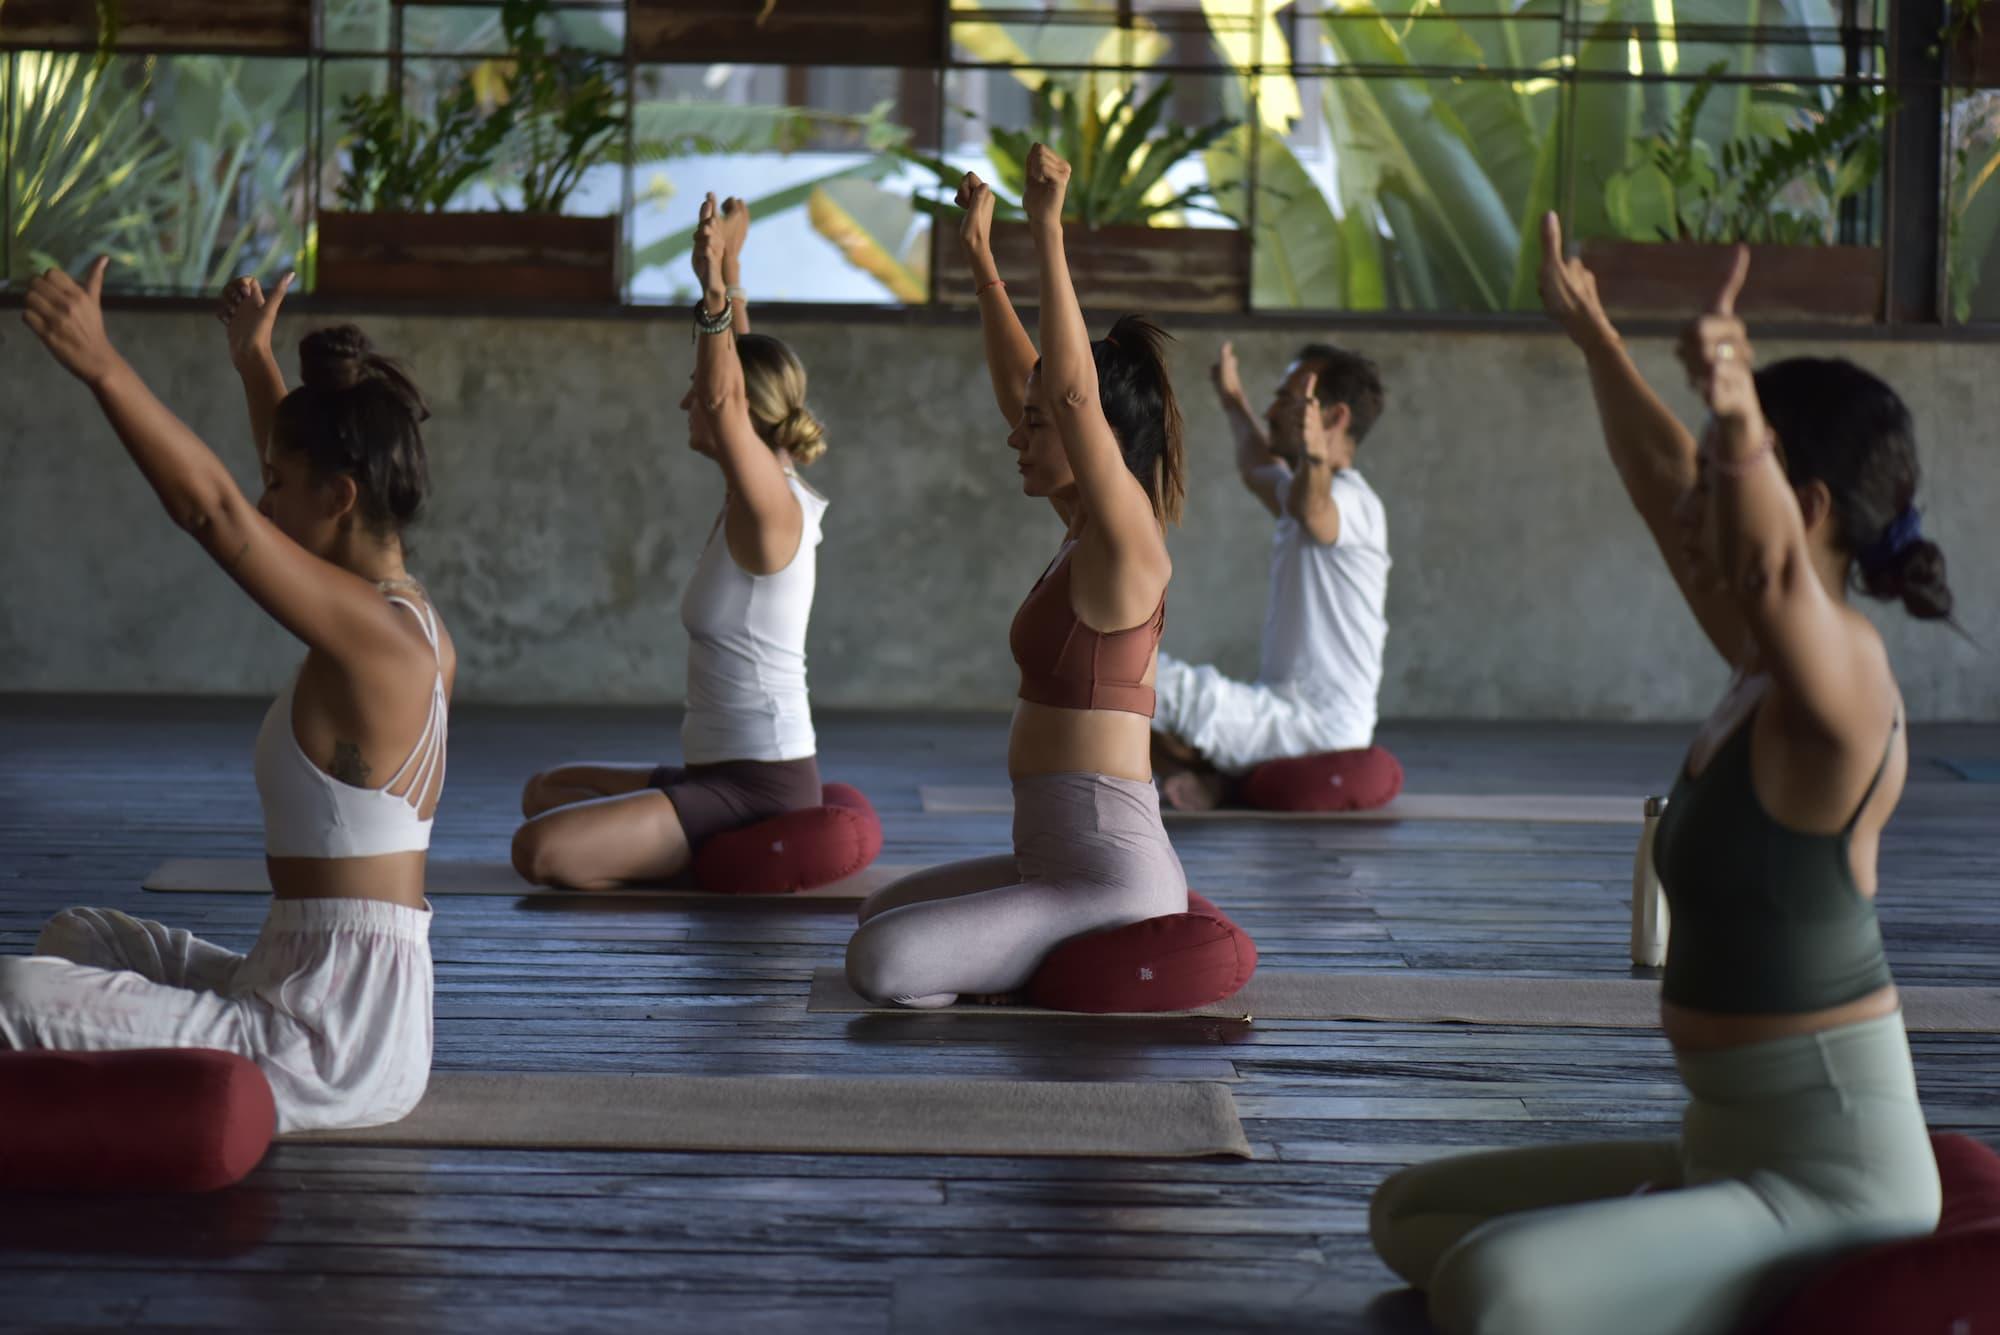 Kundalini practices